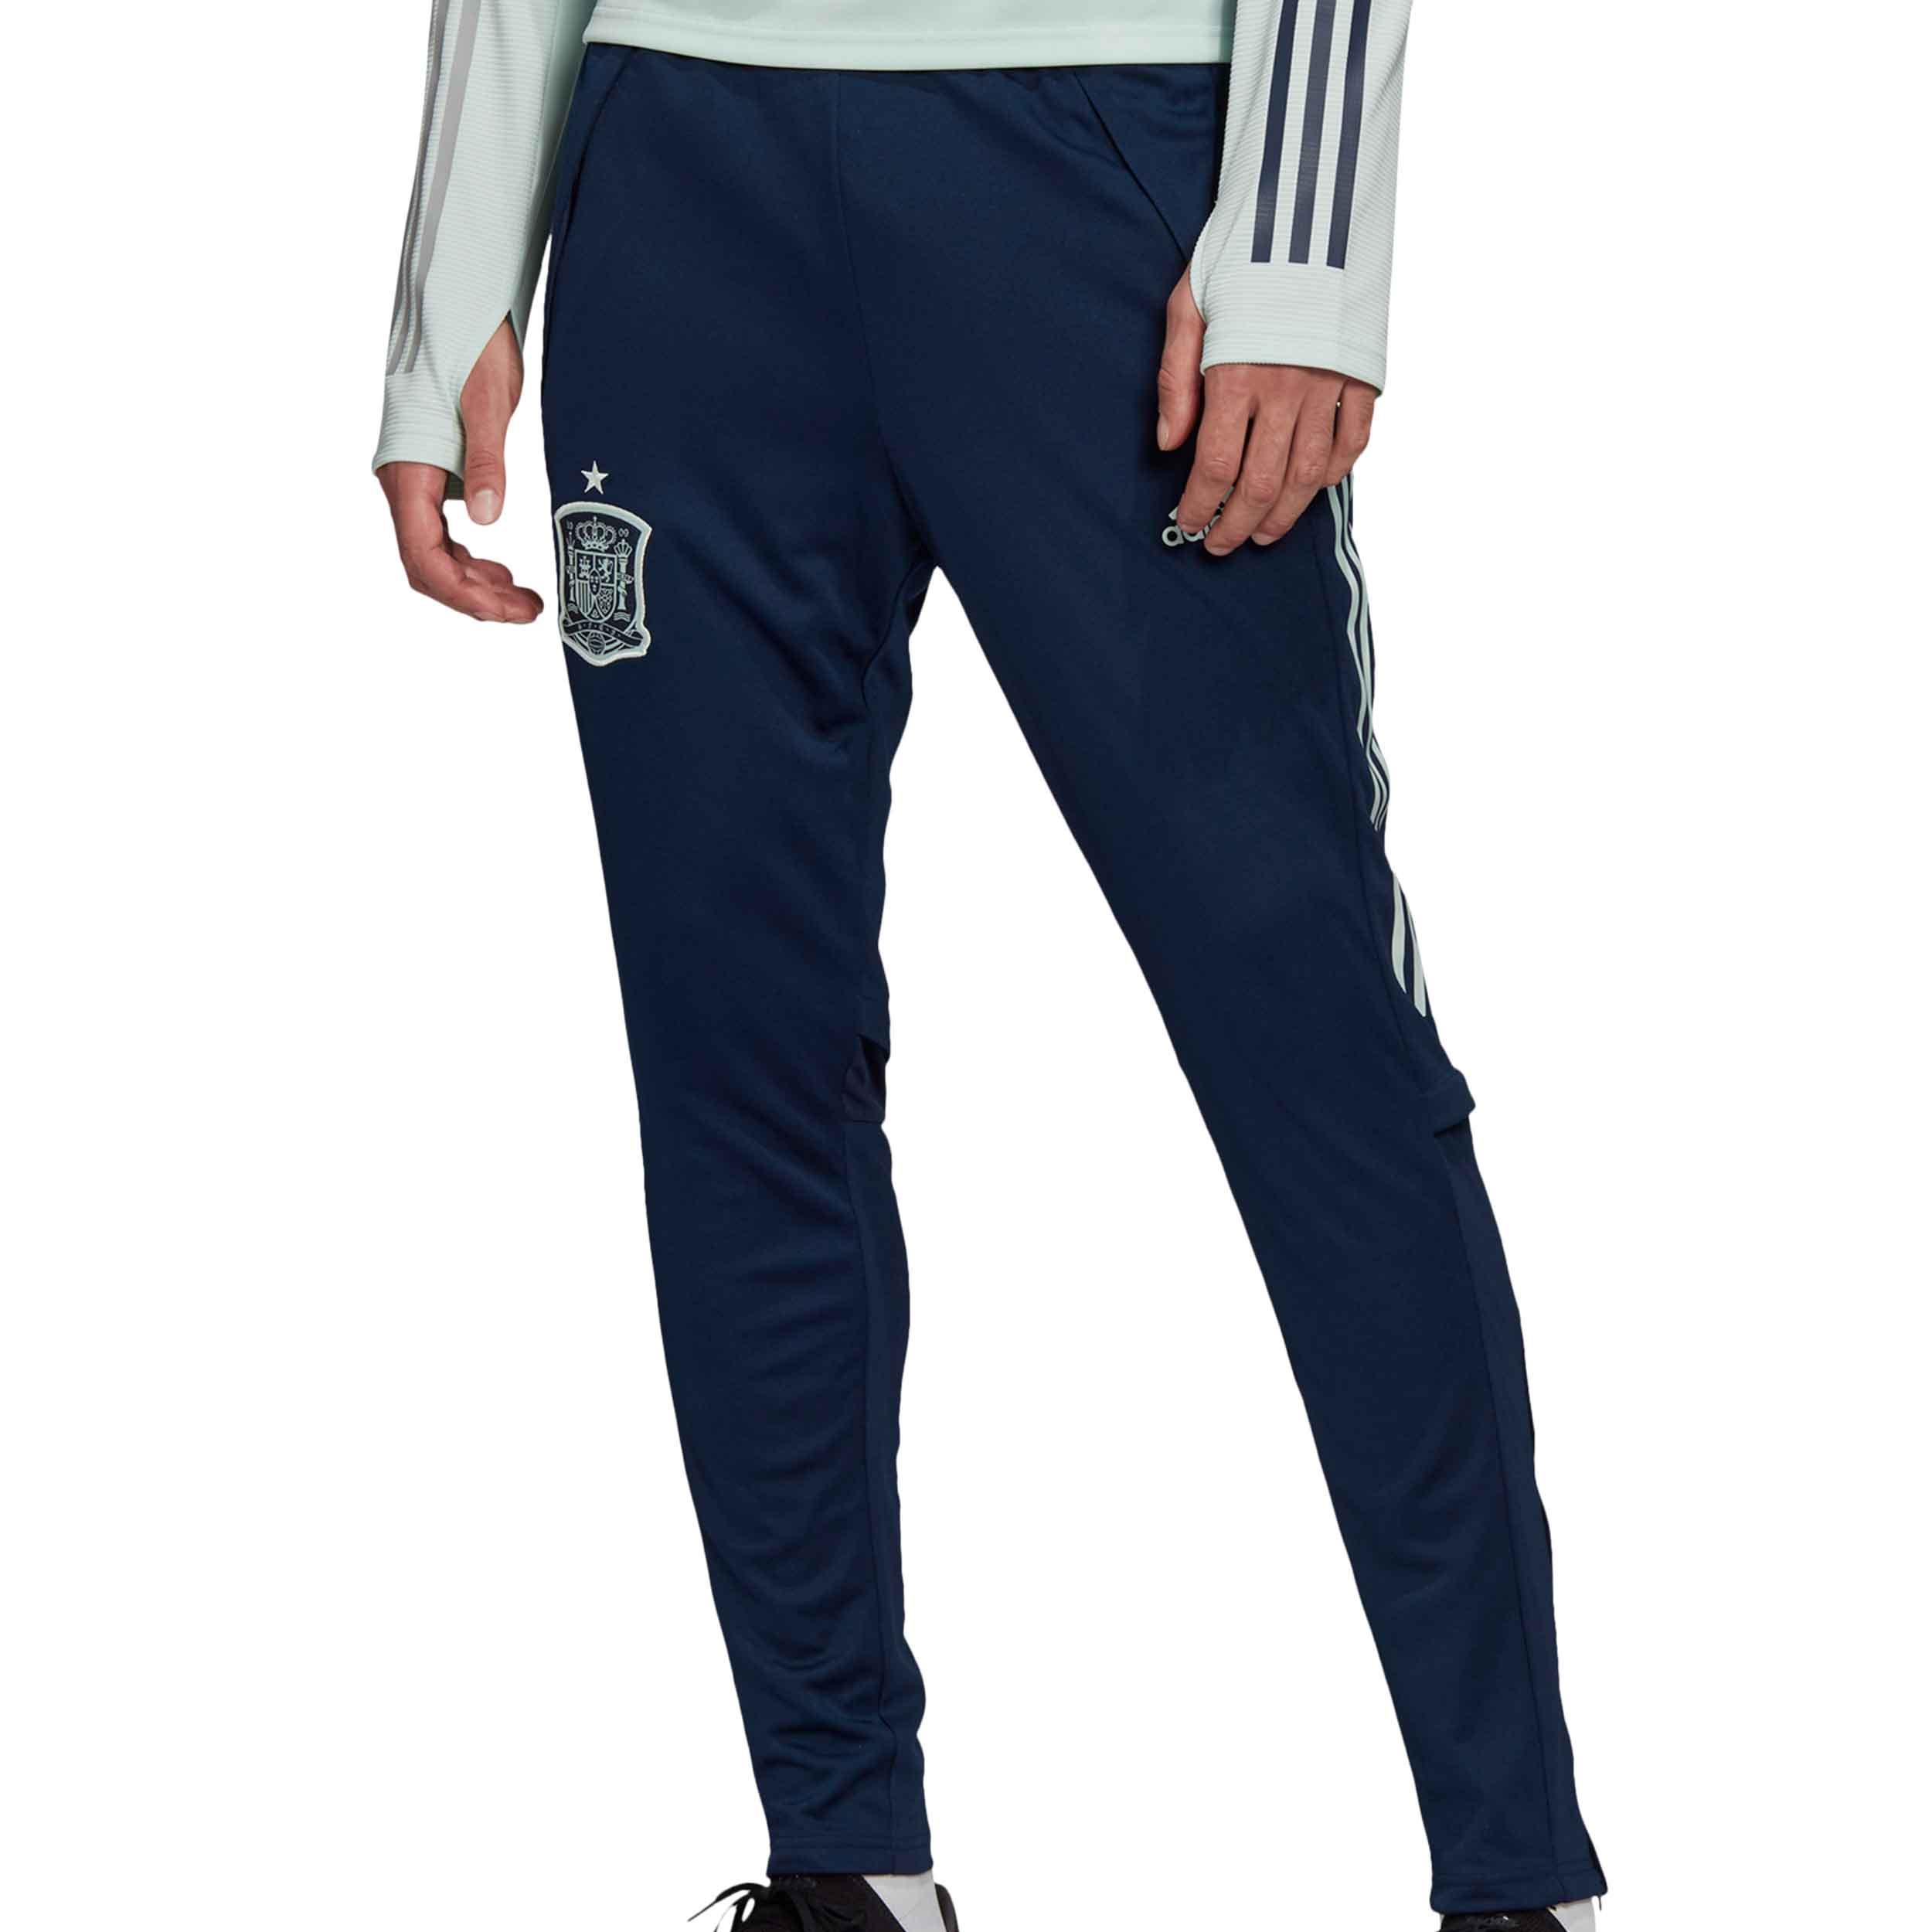 Pantalon Adidas Espana Entreno 2020 2021 Futbolmania